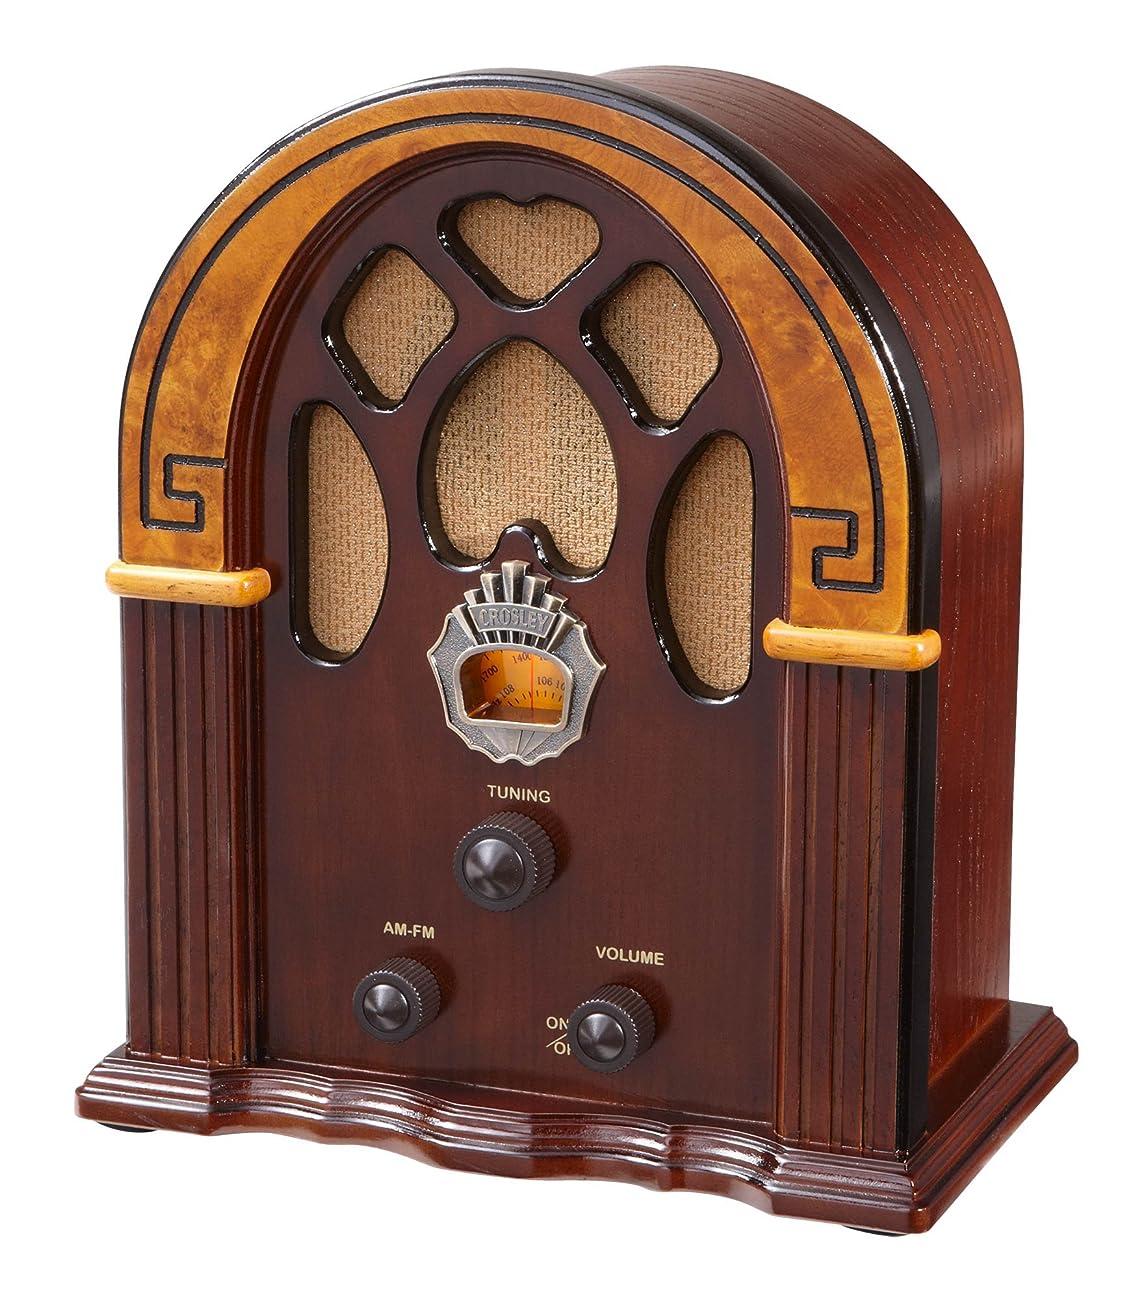 Crosley CR31-WA Companion Retro AM/FM Radio with Full-Range Speaker, Walnut & Burl 0